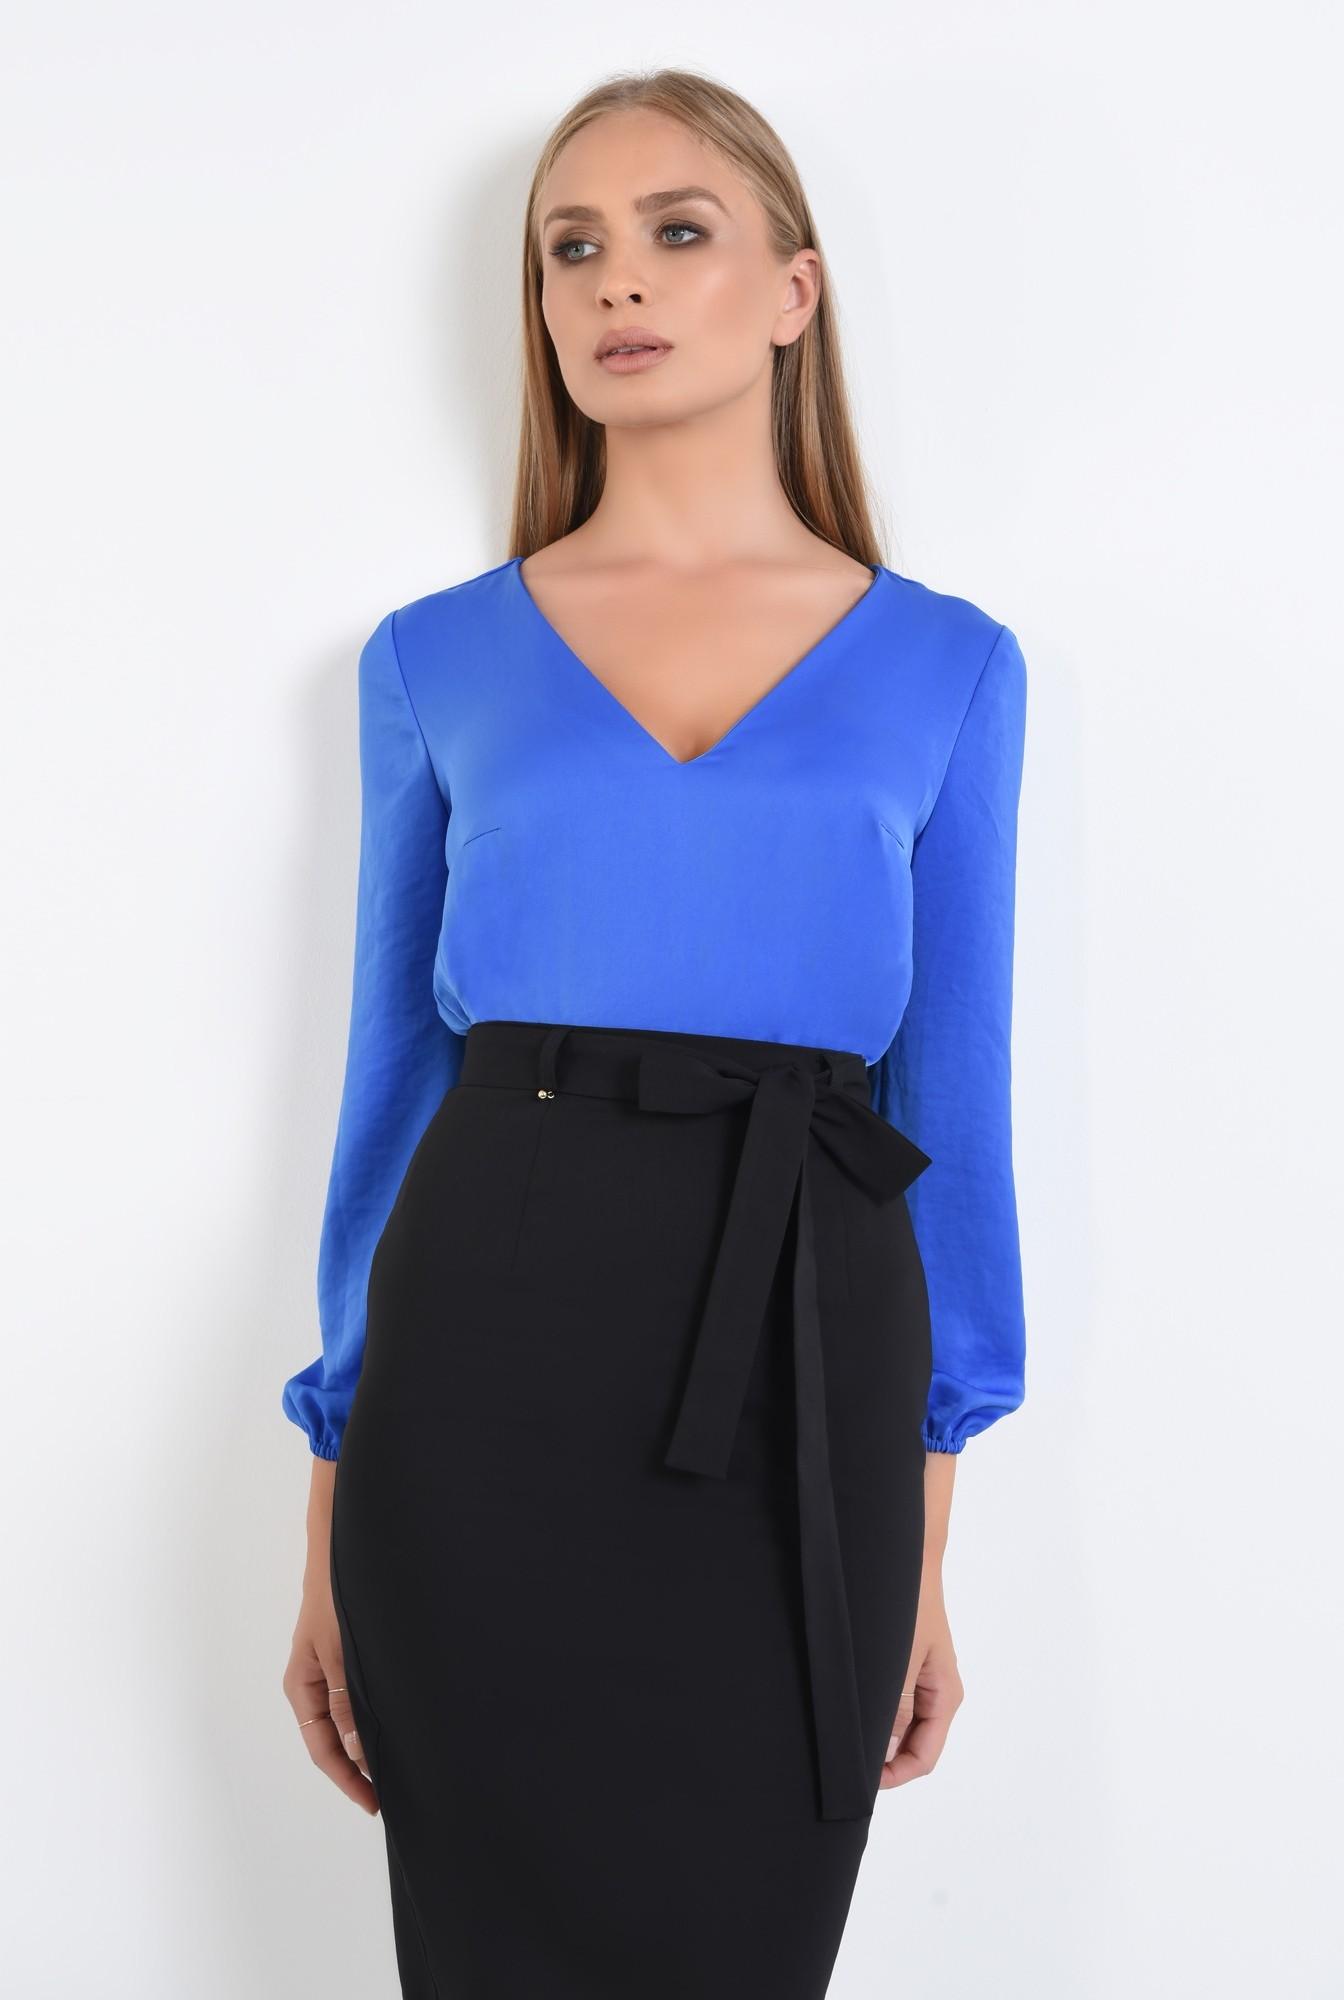 3 - bluza office cu anchior, tesatura satinata, bluze online